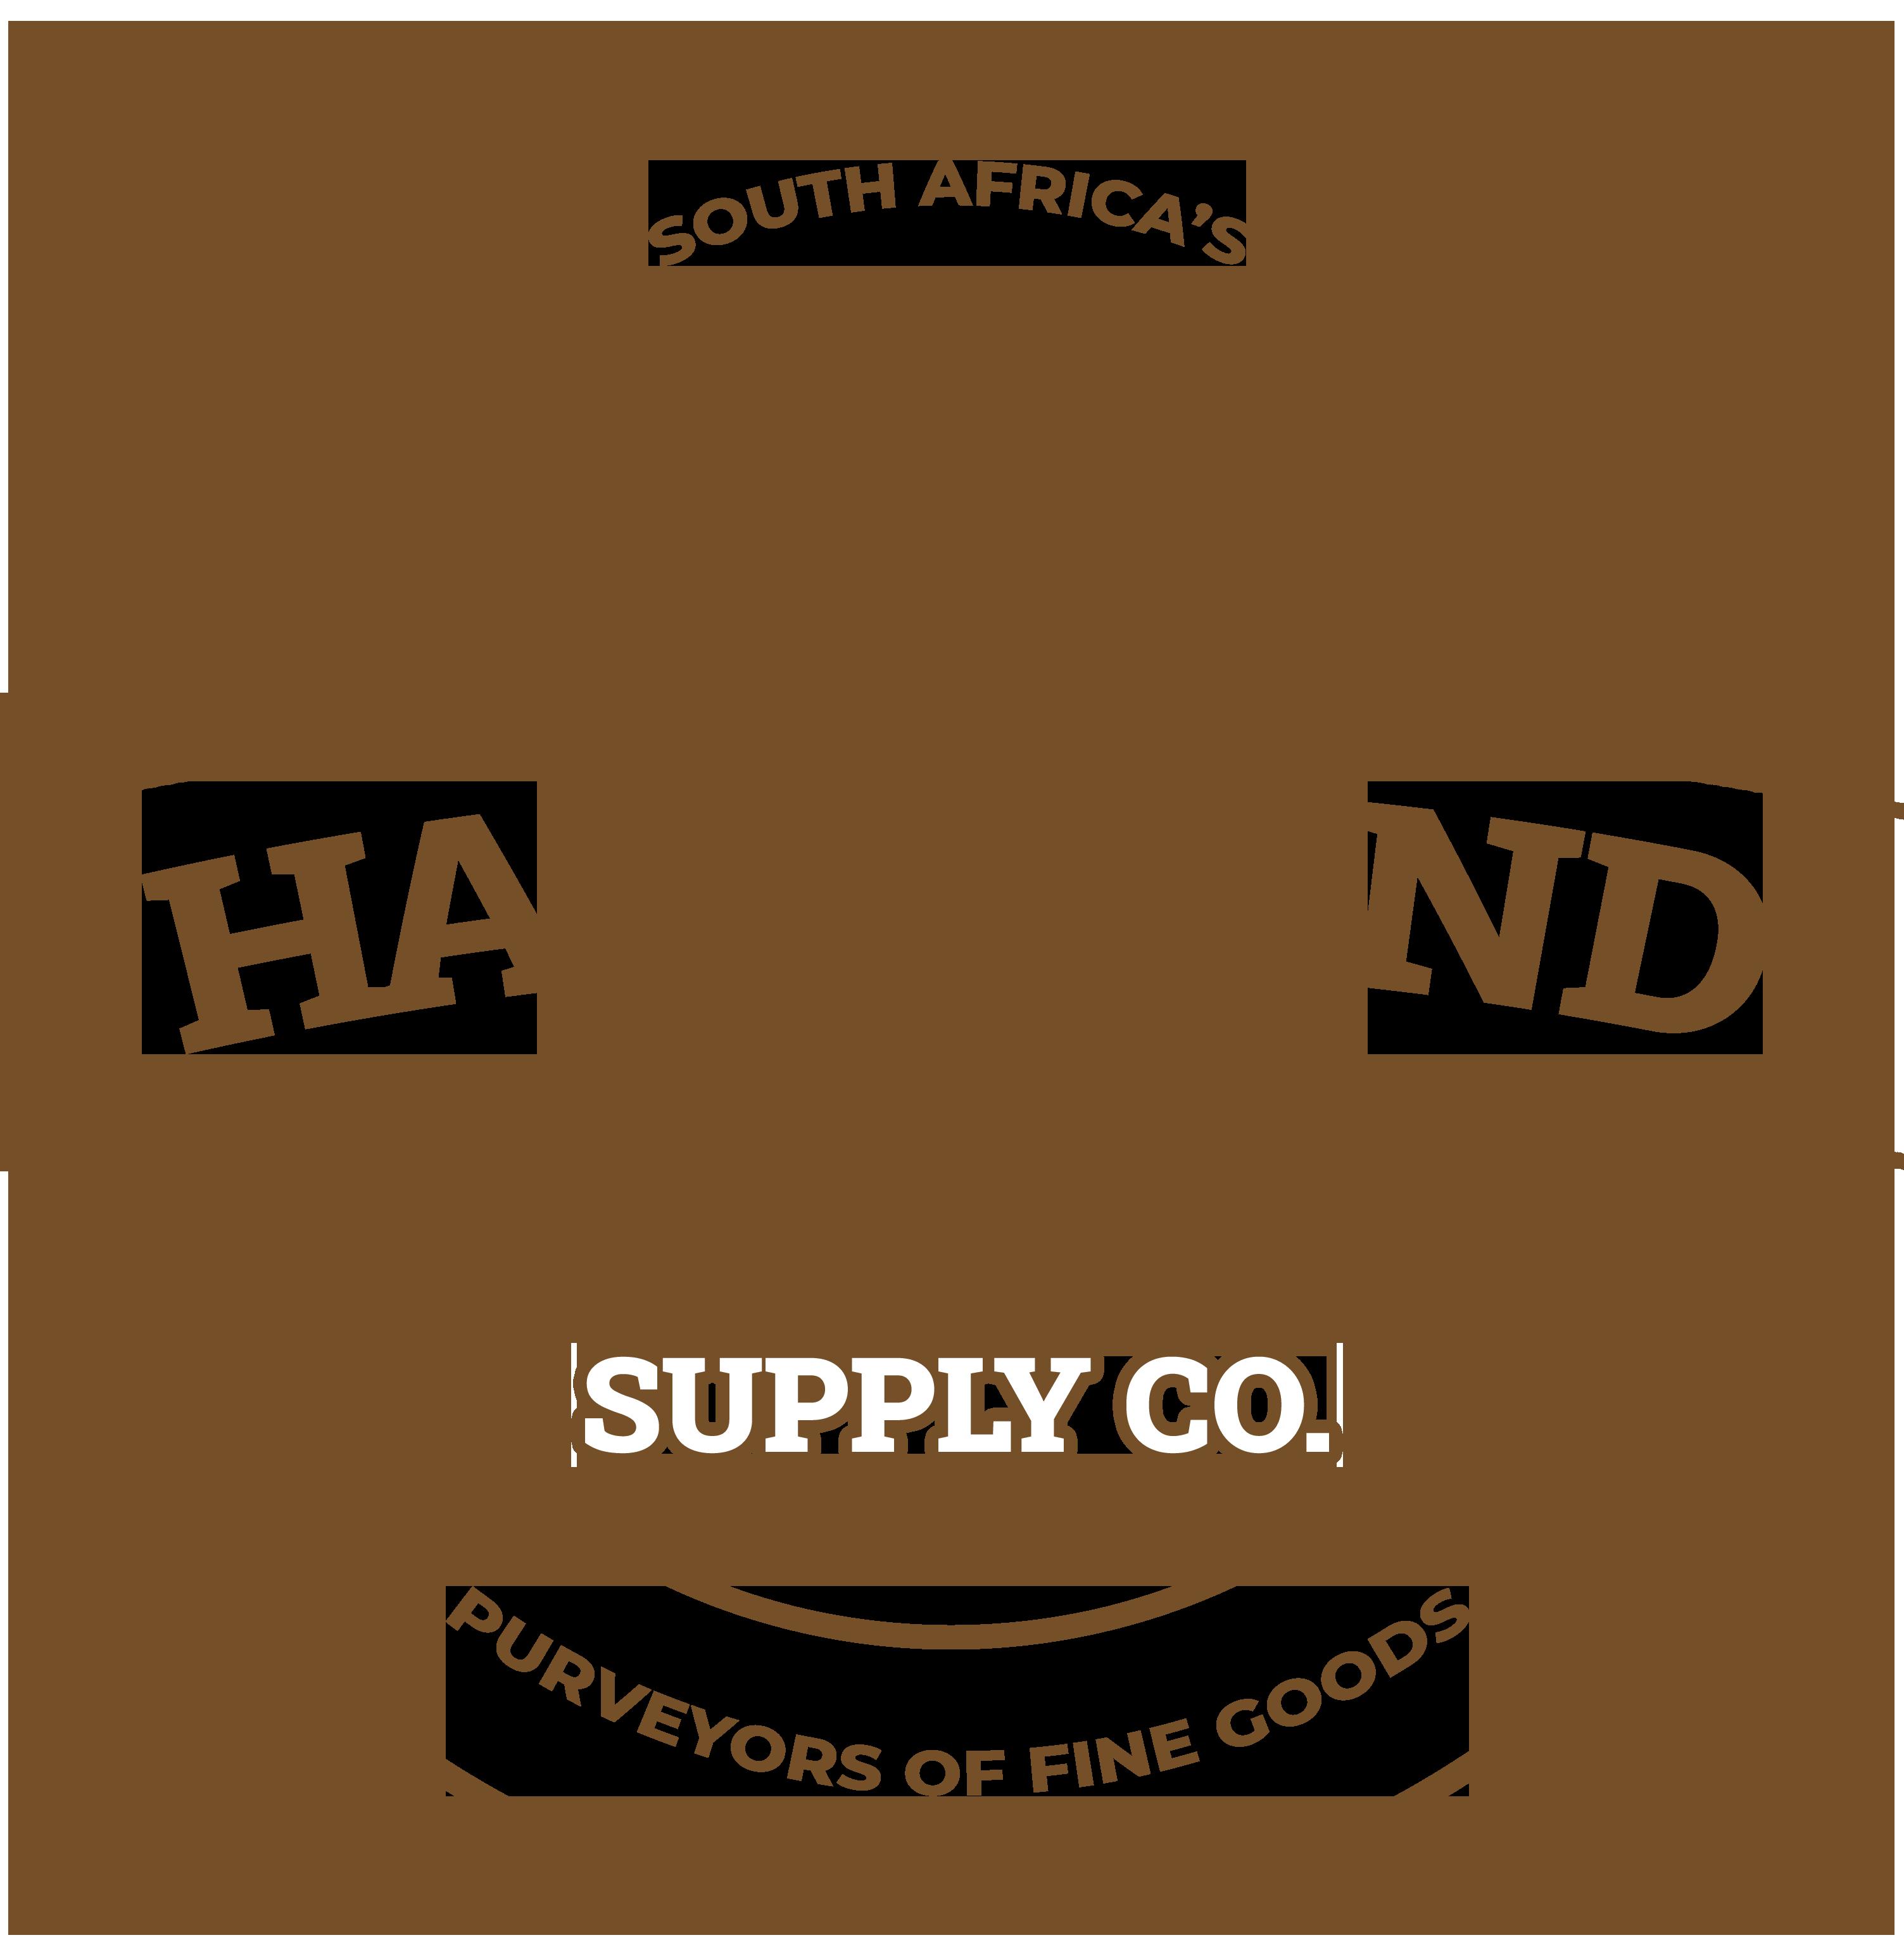 Hartland logo brown circle